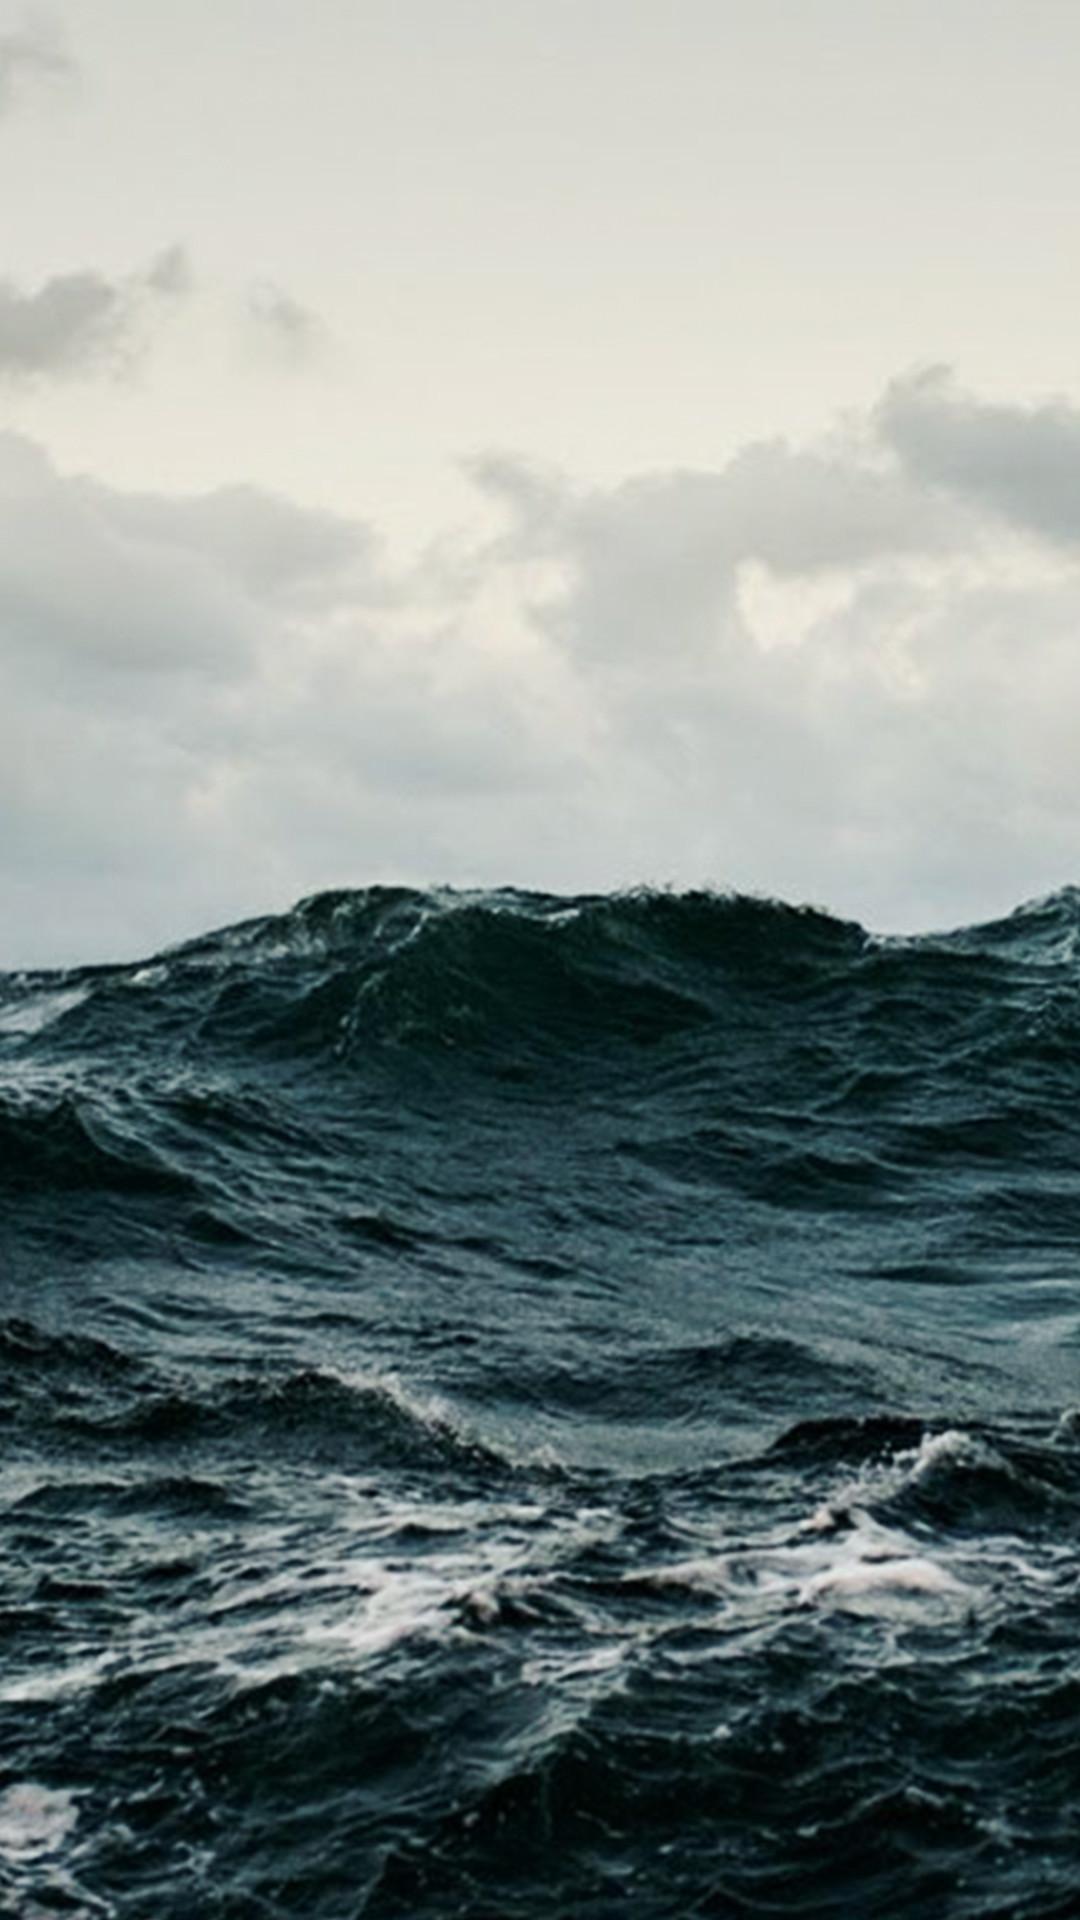 Stormy Ocean Wallpaper 58 Images